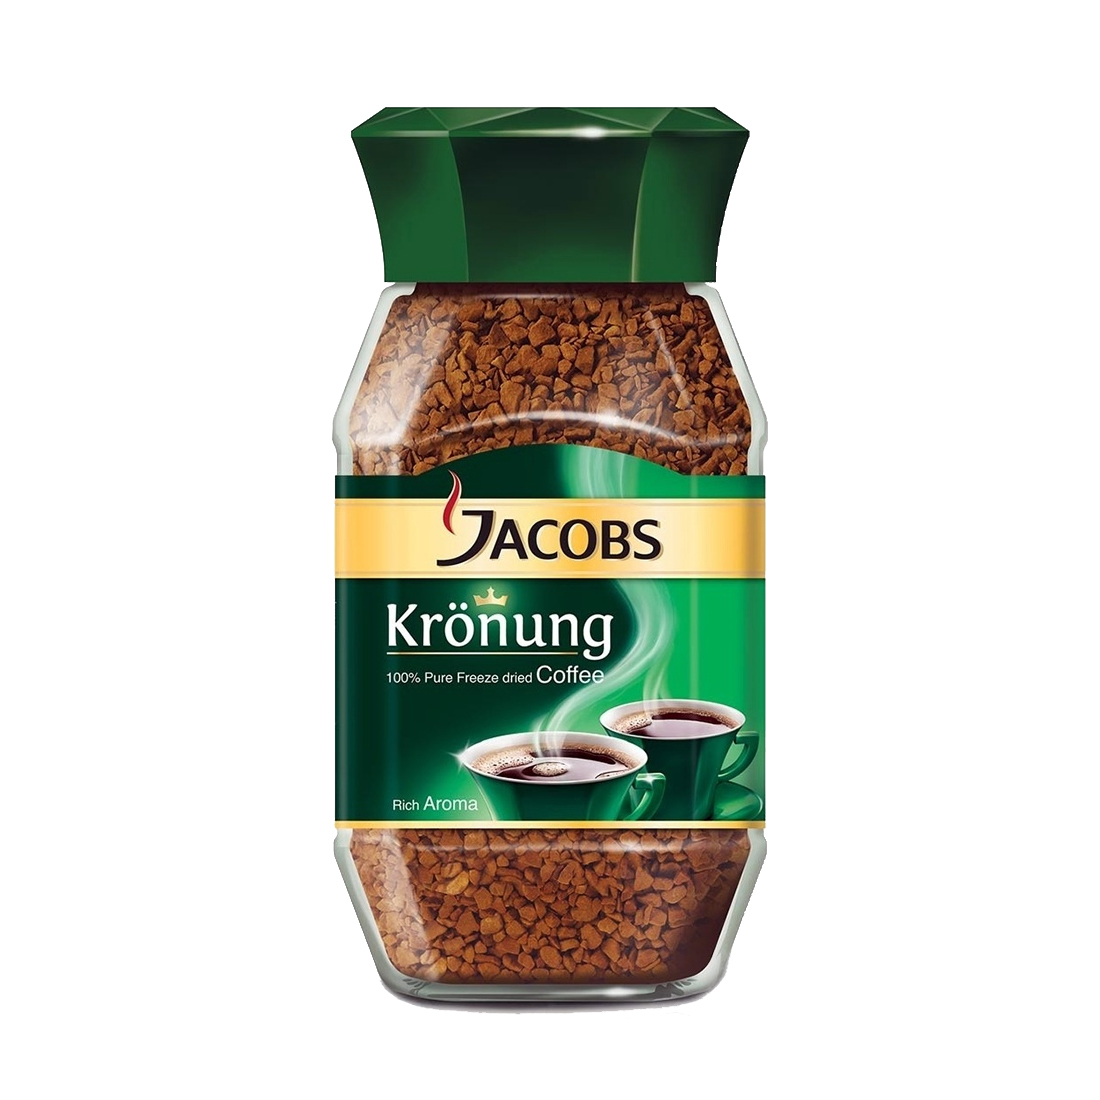 قوطی قهوه فوری جاکوبز مدل مونارک مقدار 200 گرم